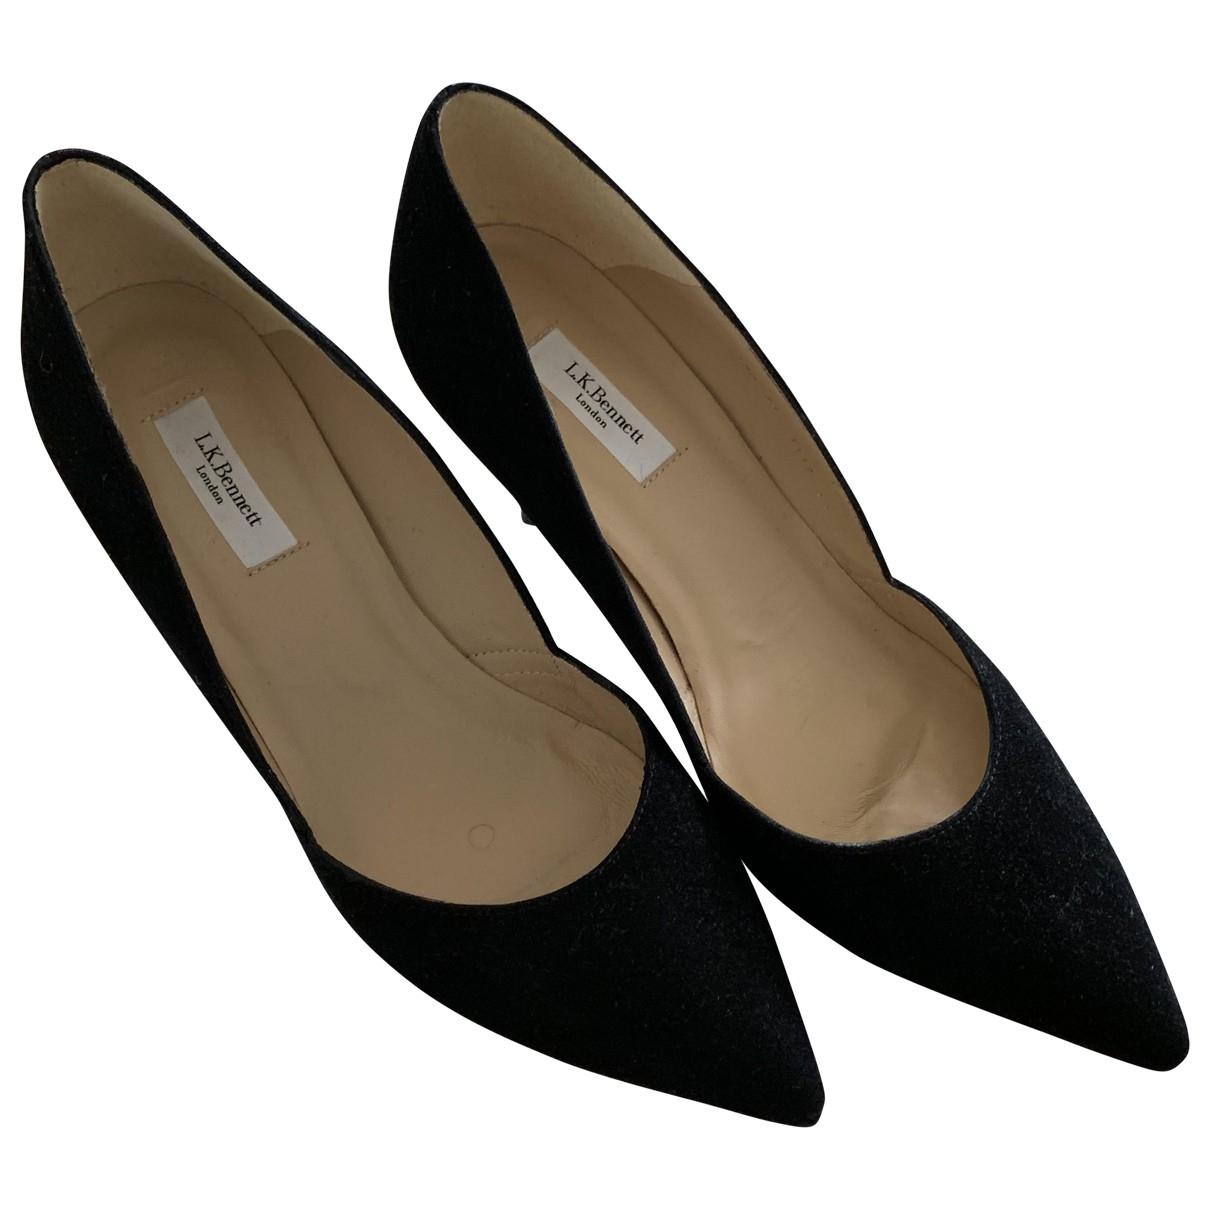 Lk Bennett \N Black Suede Heels for Women 5 UK